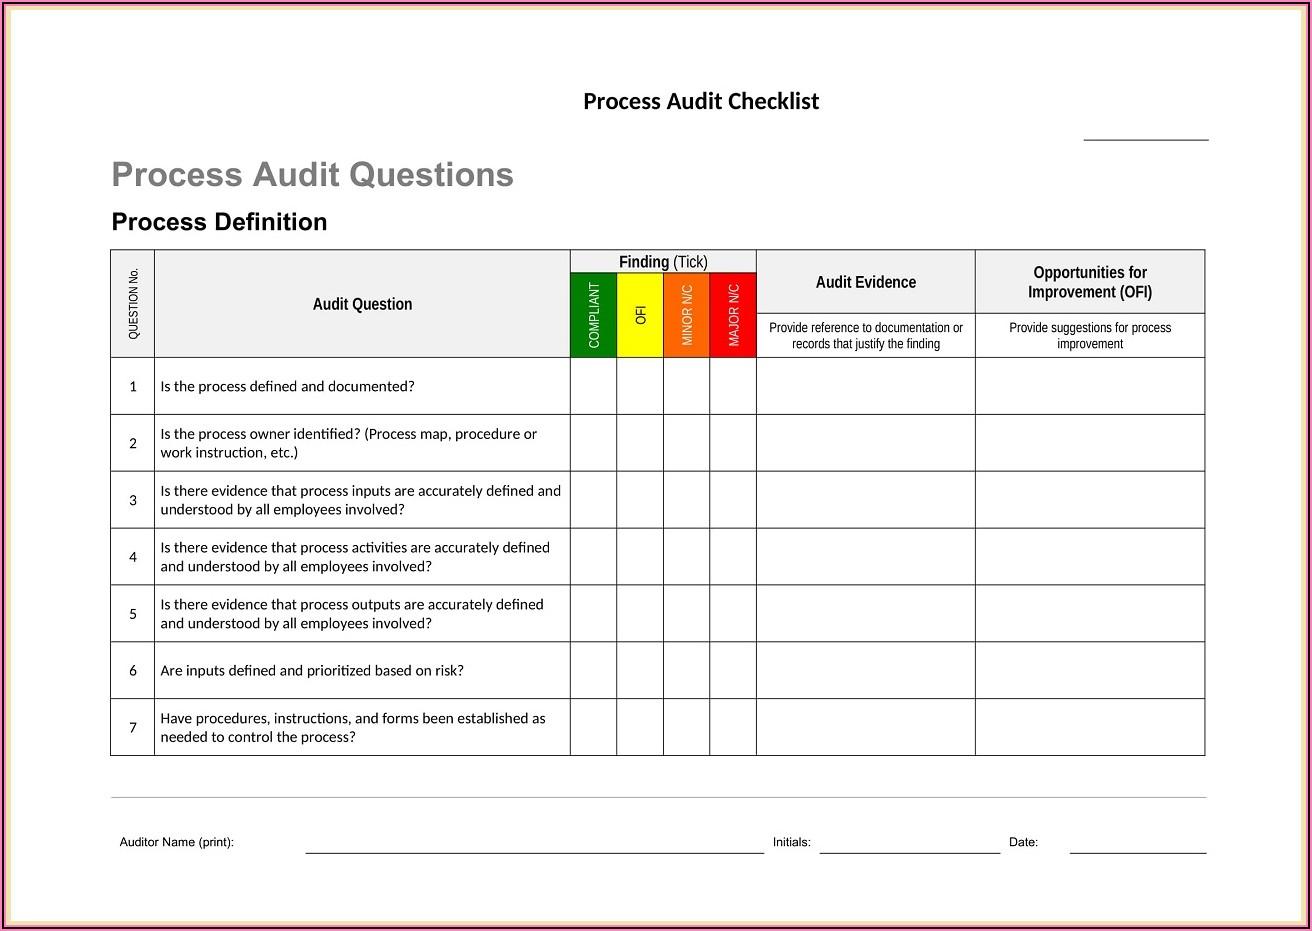 Process Audit Checklist Sample